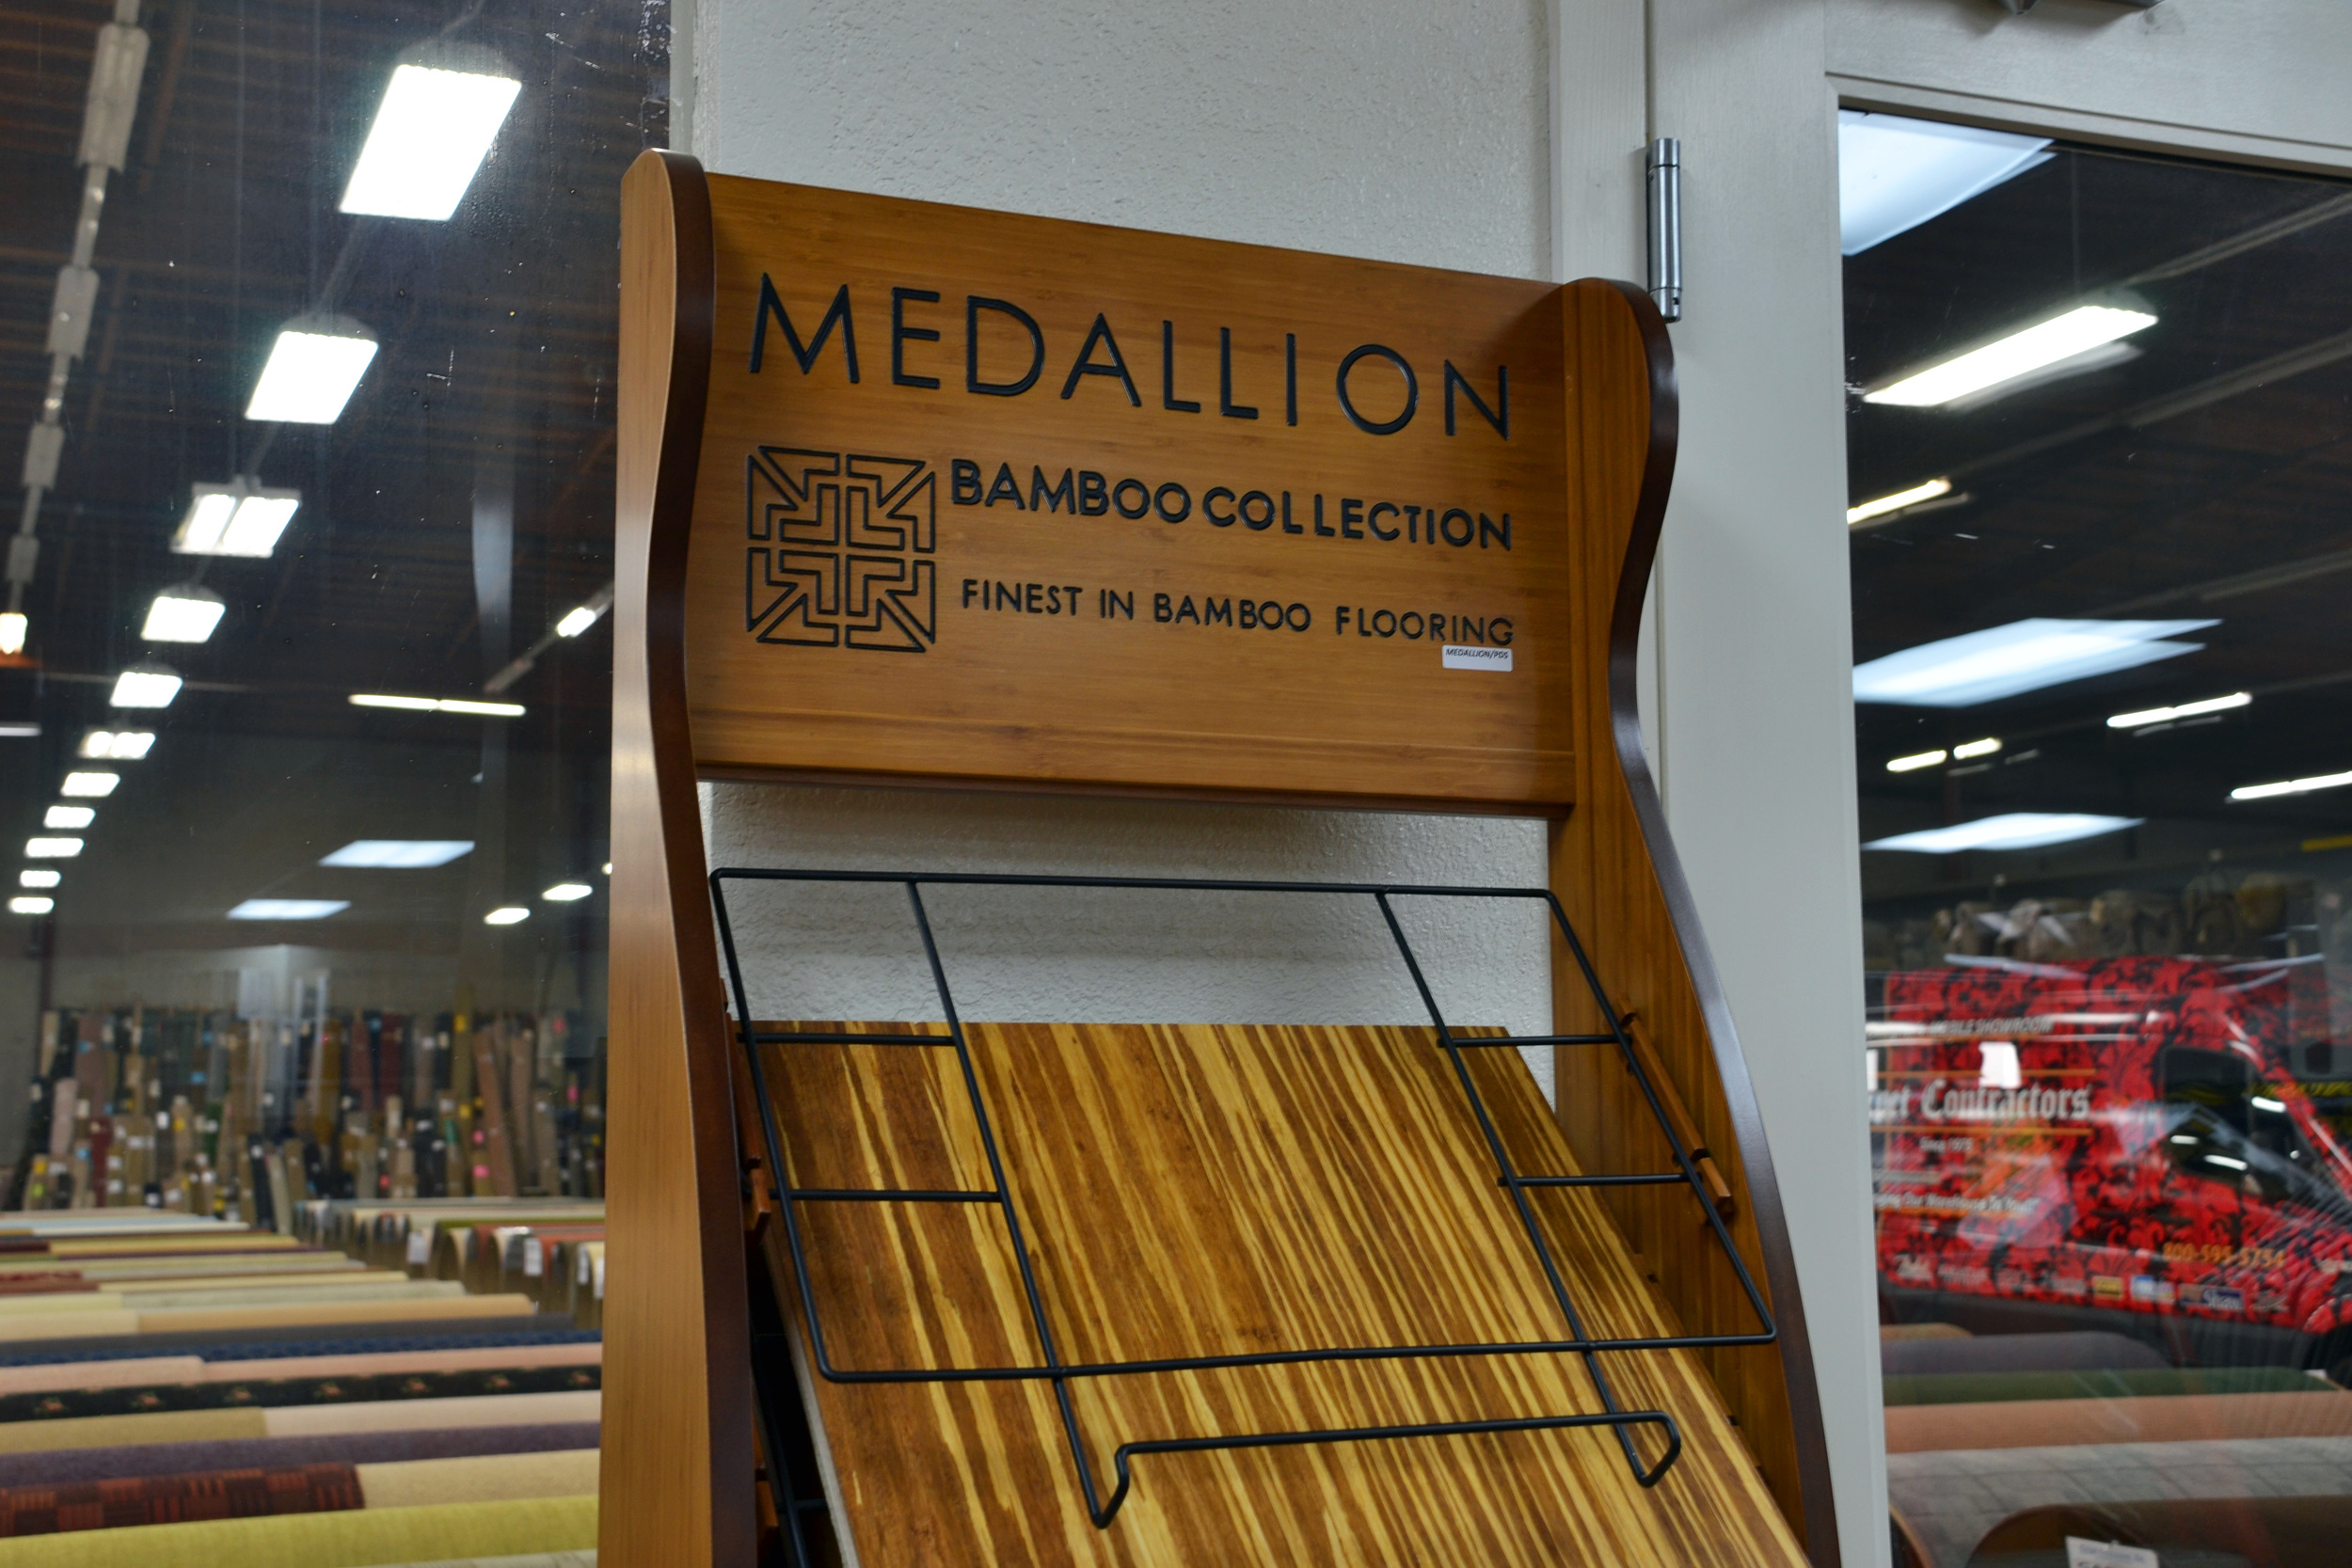 display-medallion.jpg